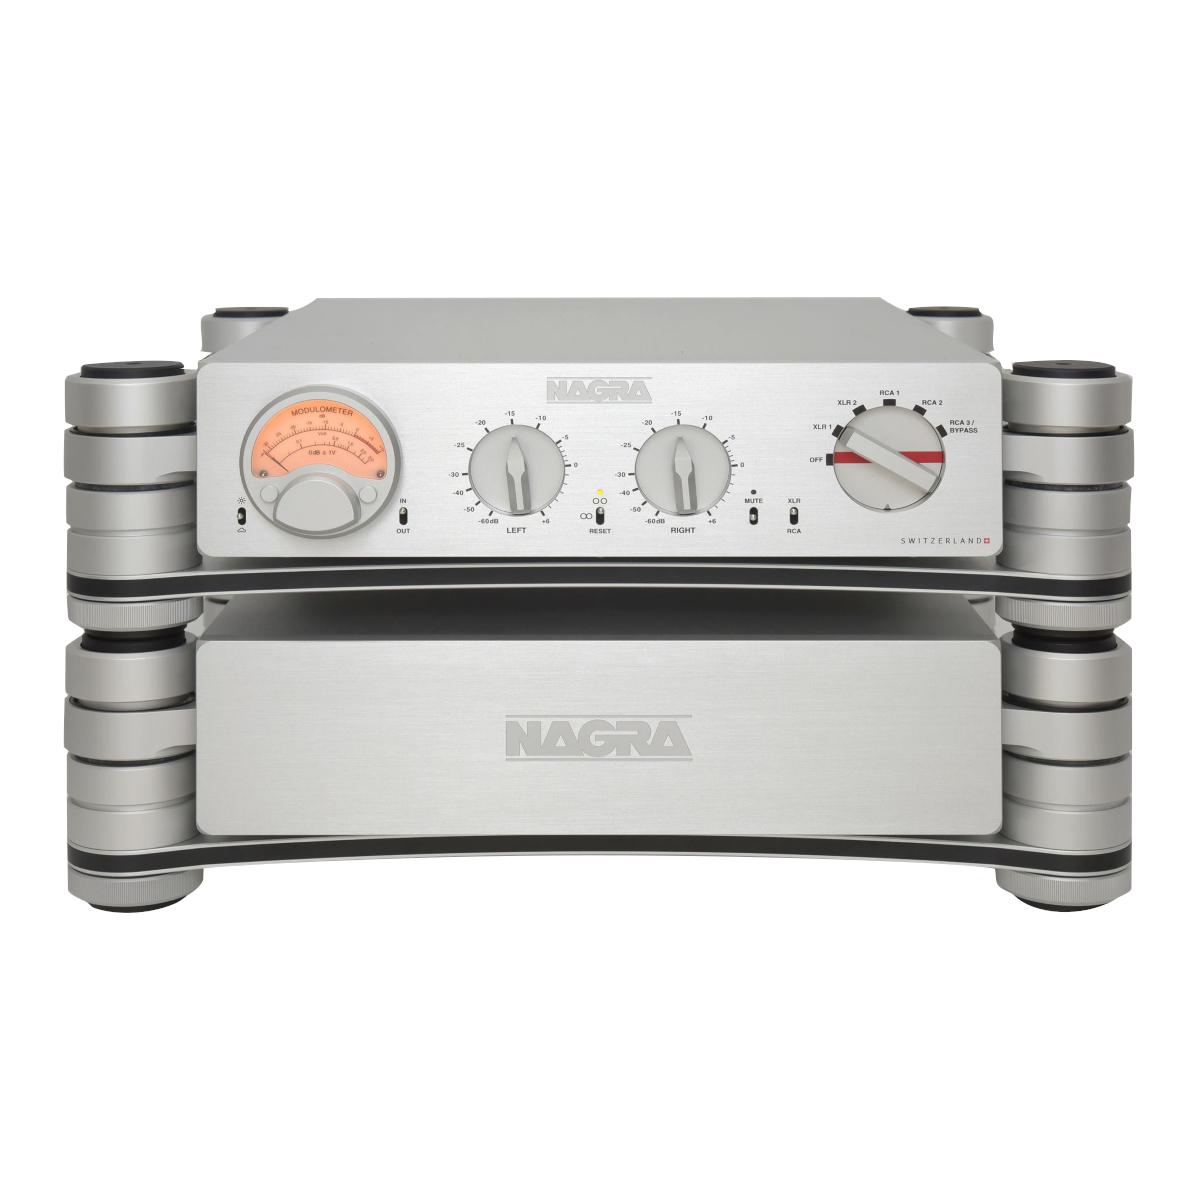 NAGRA HD PREAMP ナグラ プリアンプ